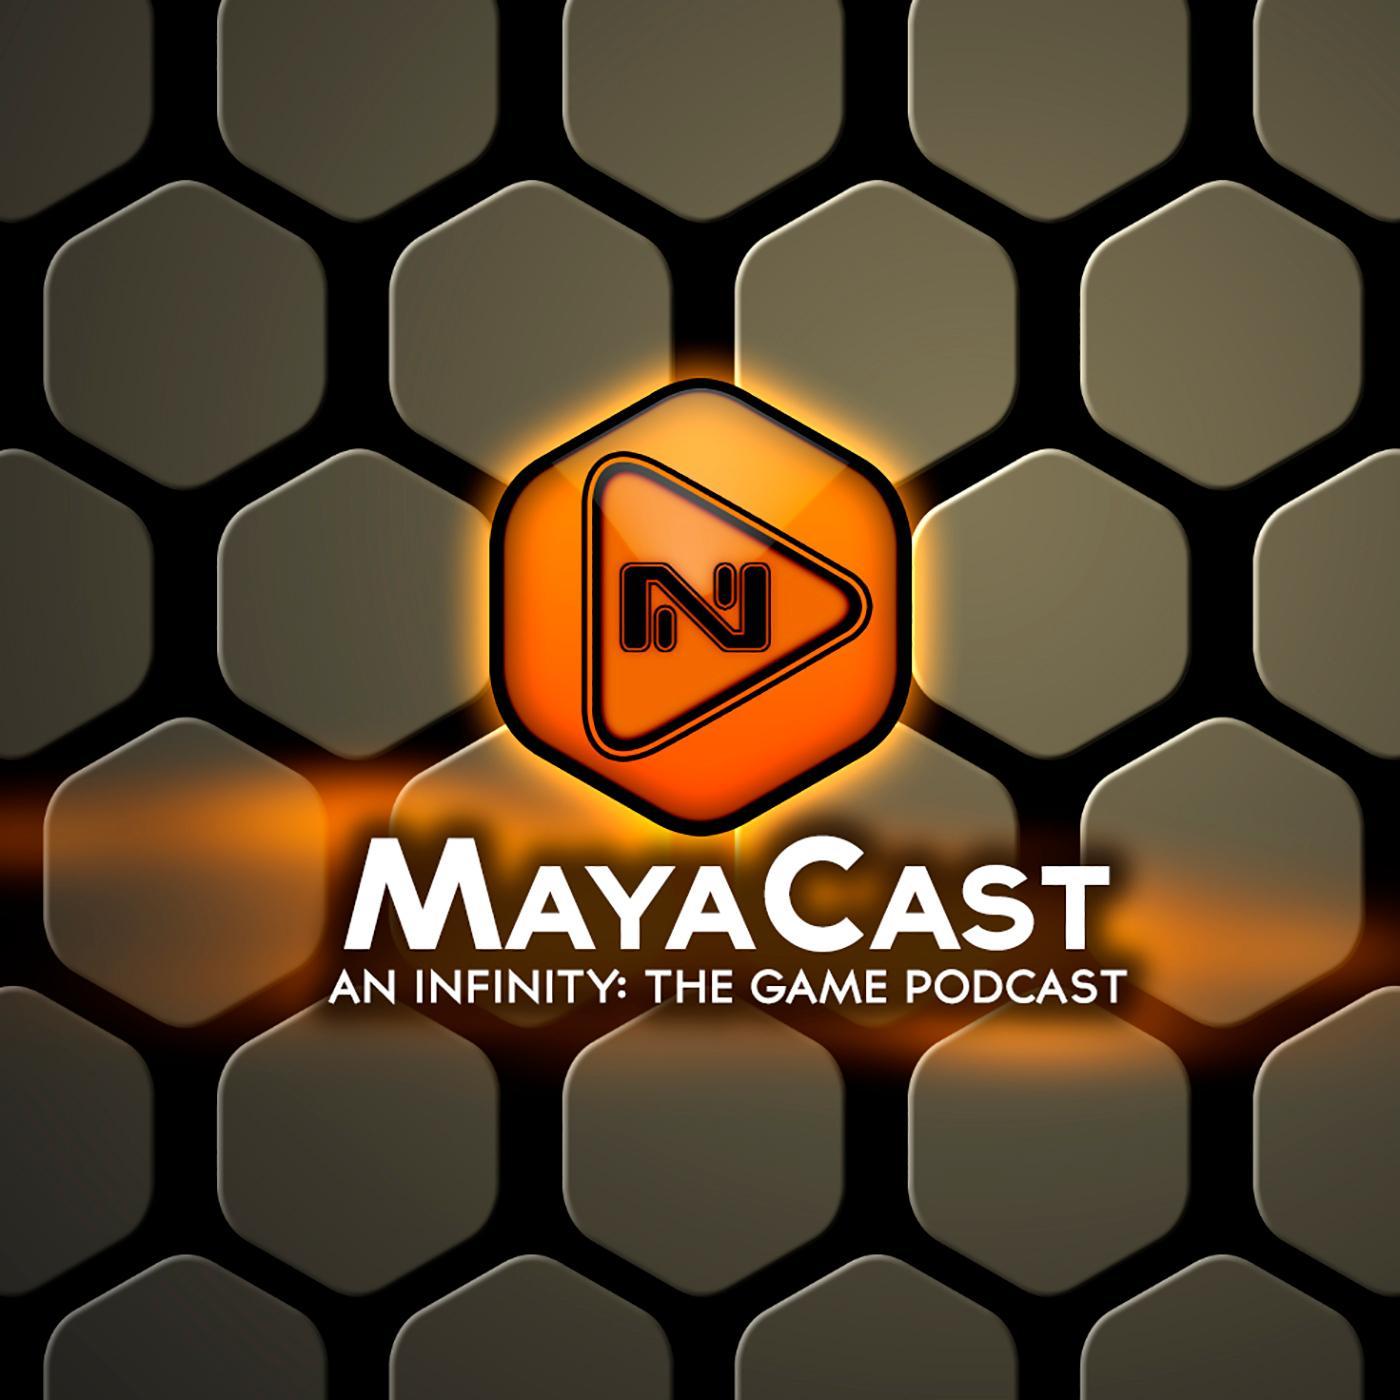 MayaCast Episode 114: Happy New Year!